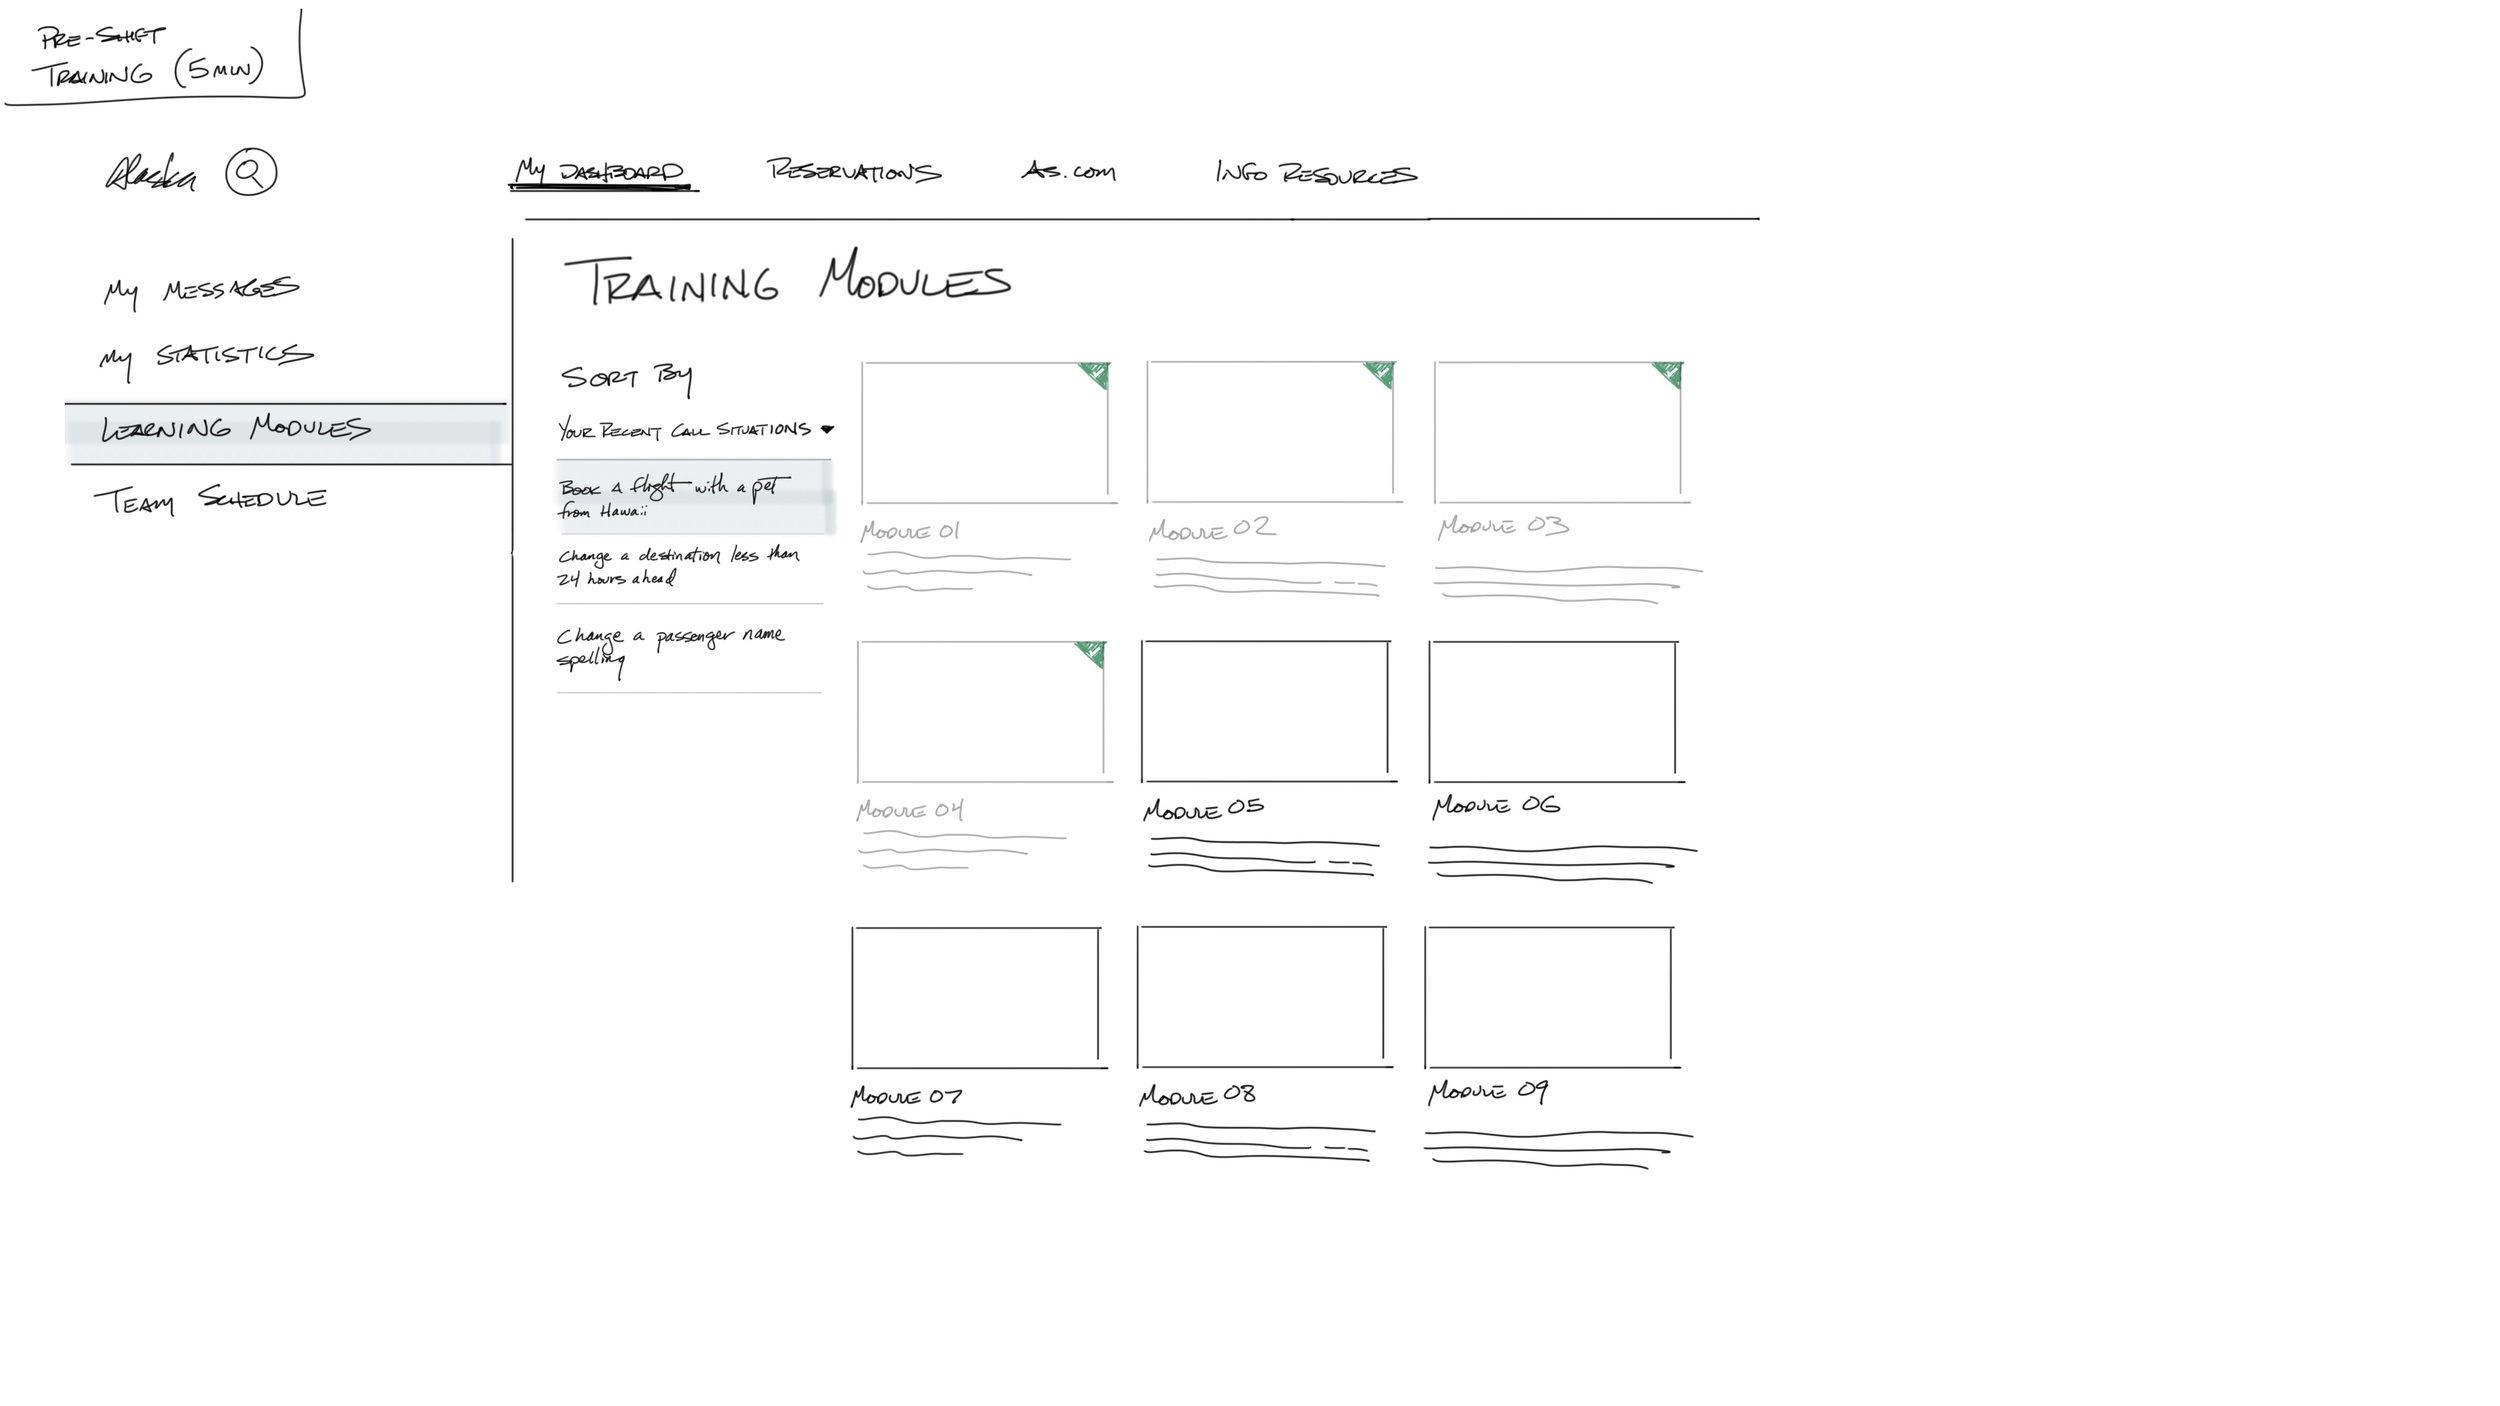 Training+Modules+Sketch+01.jpg